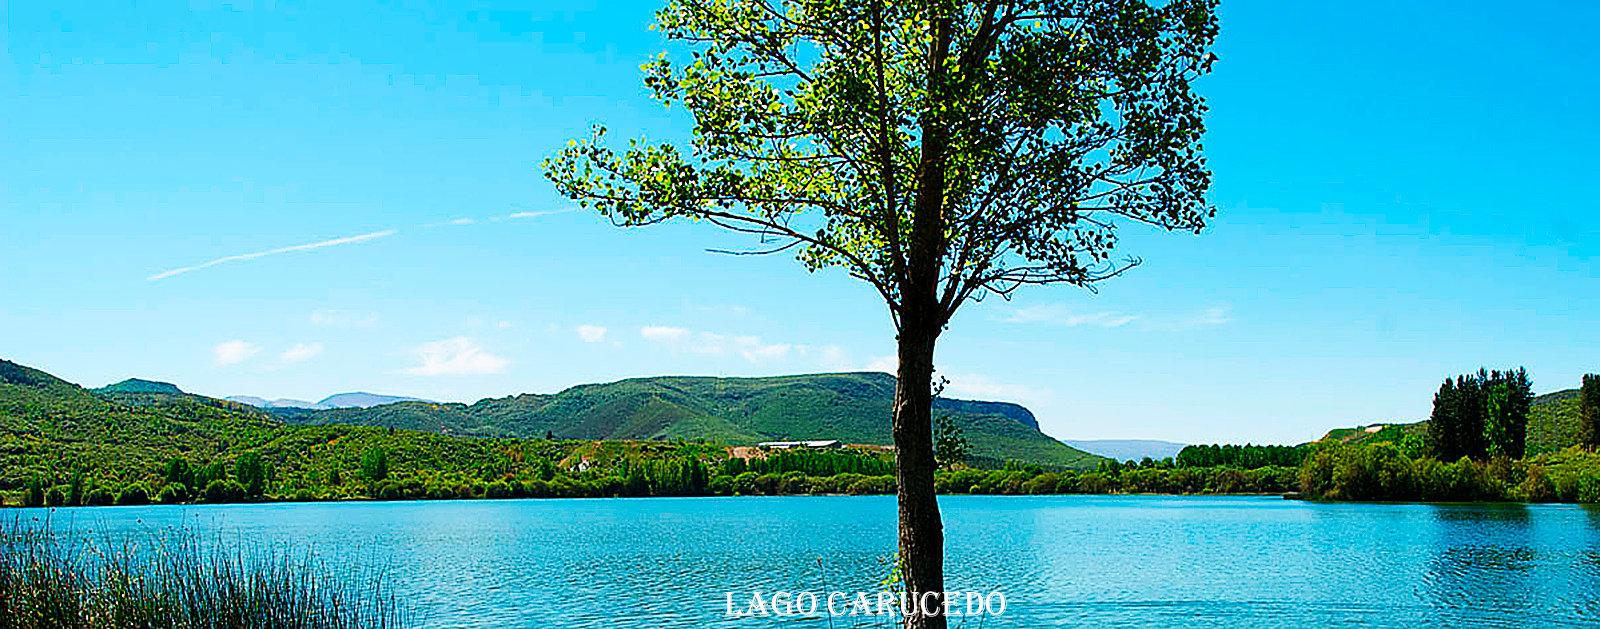 Lago Carucedo-0-WEB.jpg